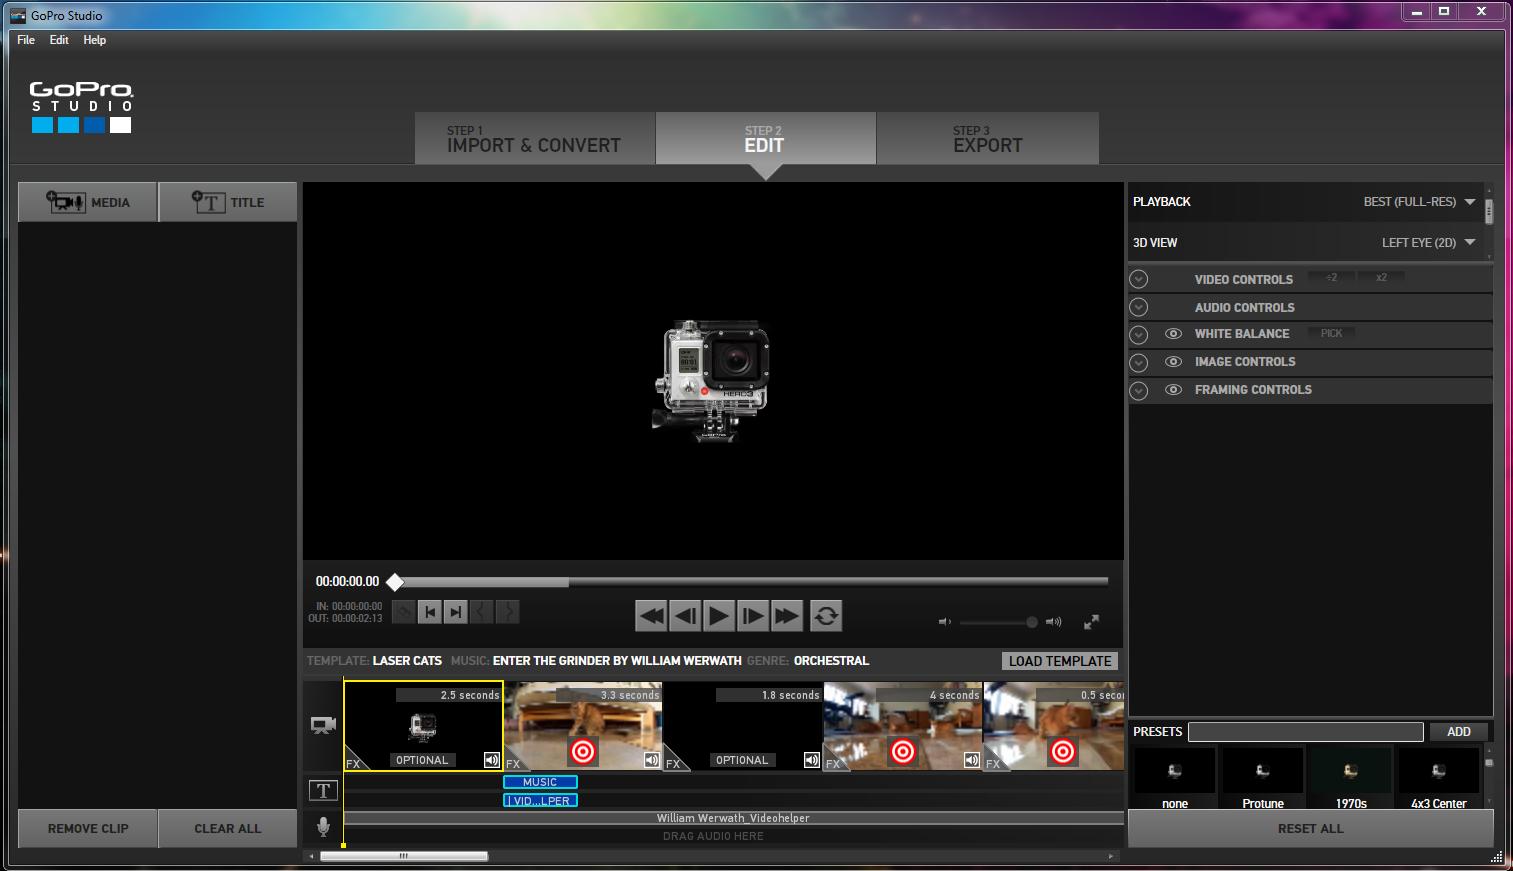 gopro studio templates download - gopro studio 2 0 cr ez simplement des montages vid os